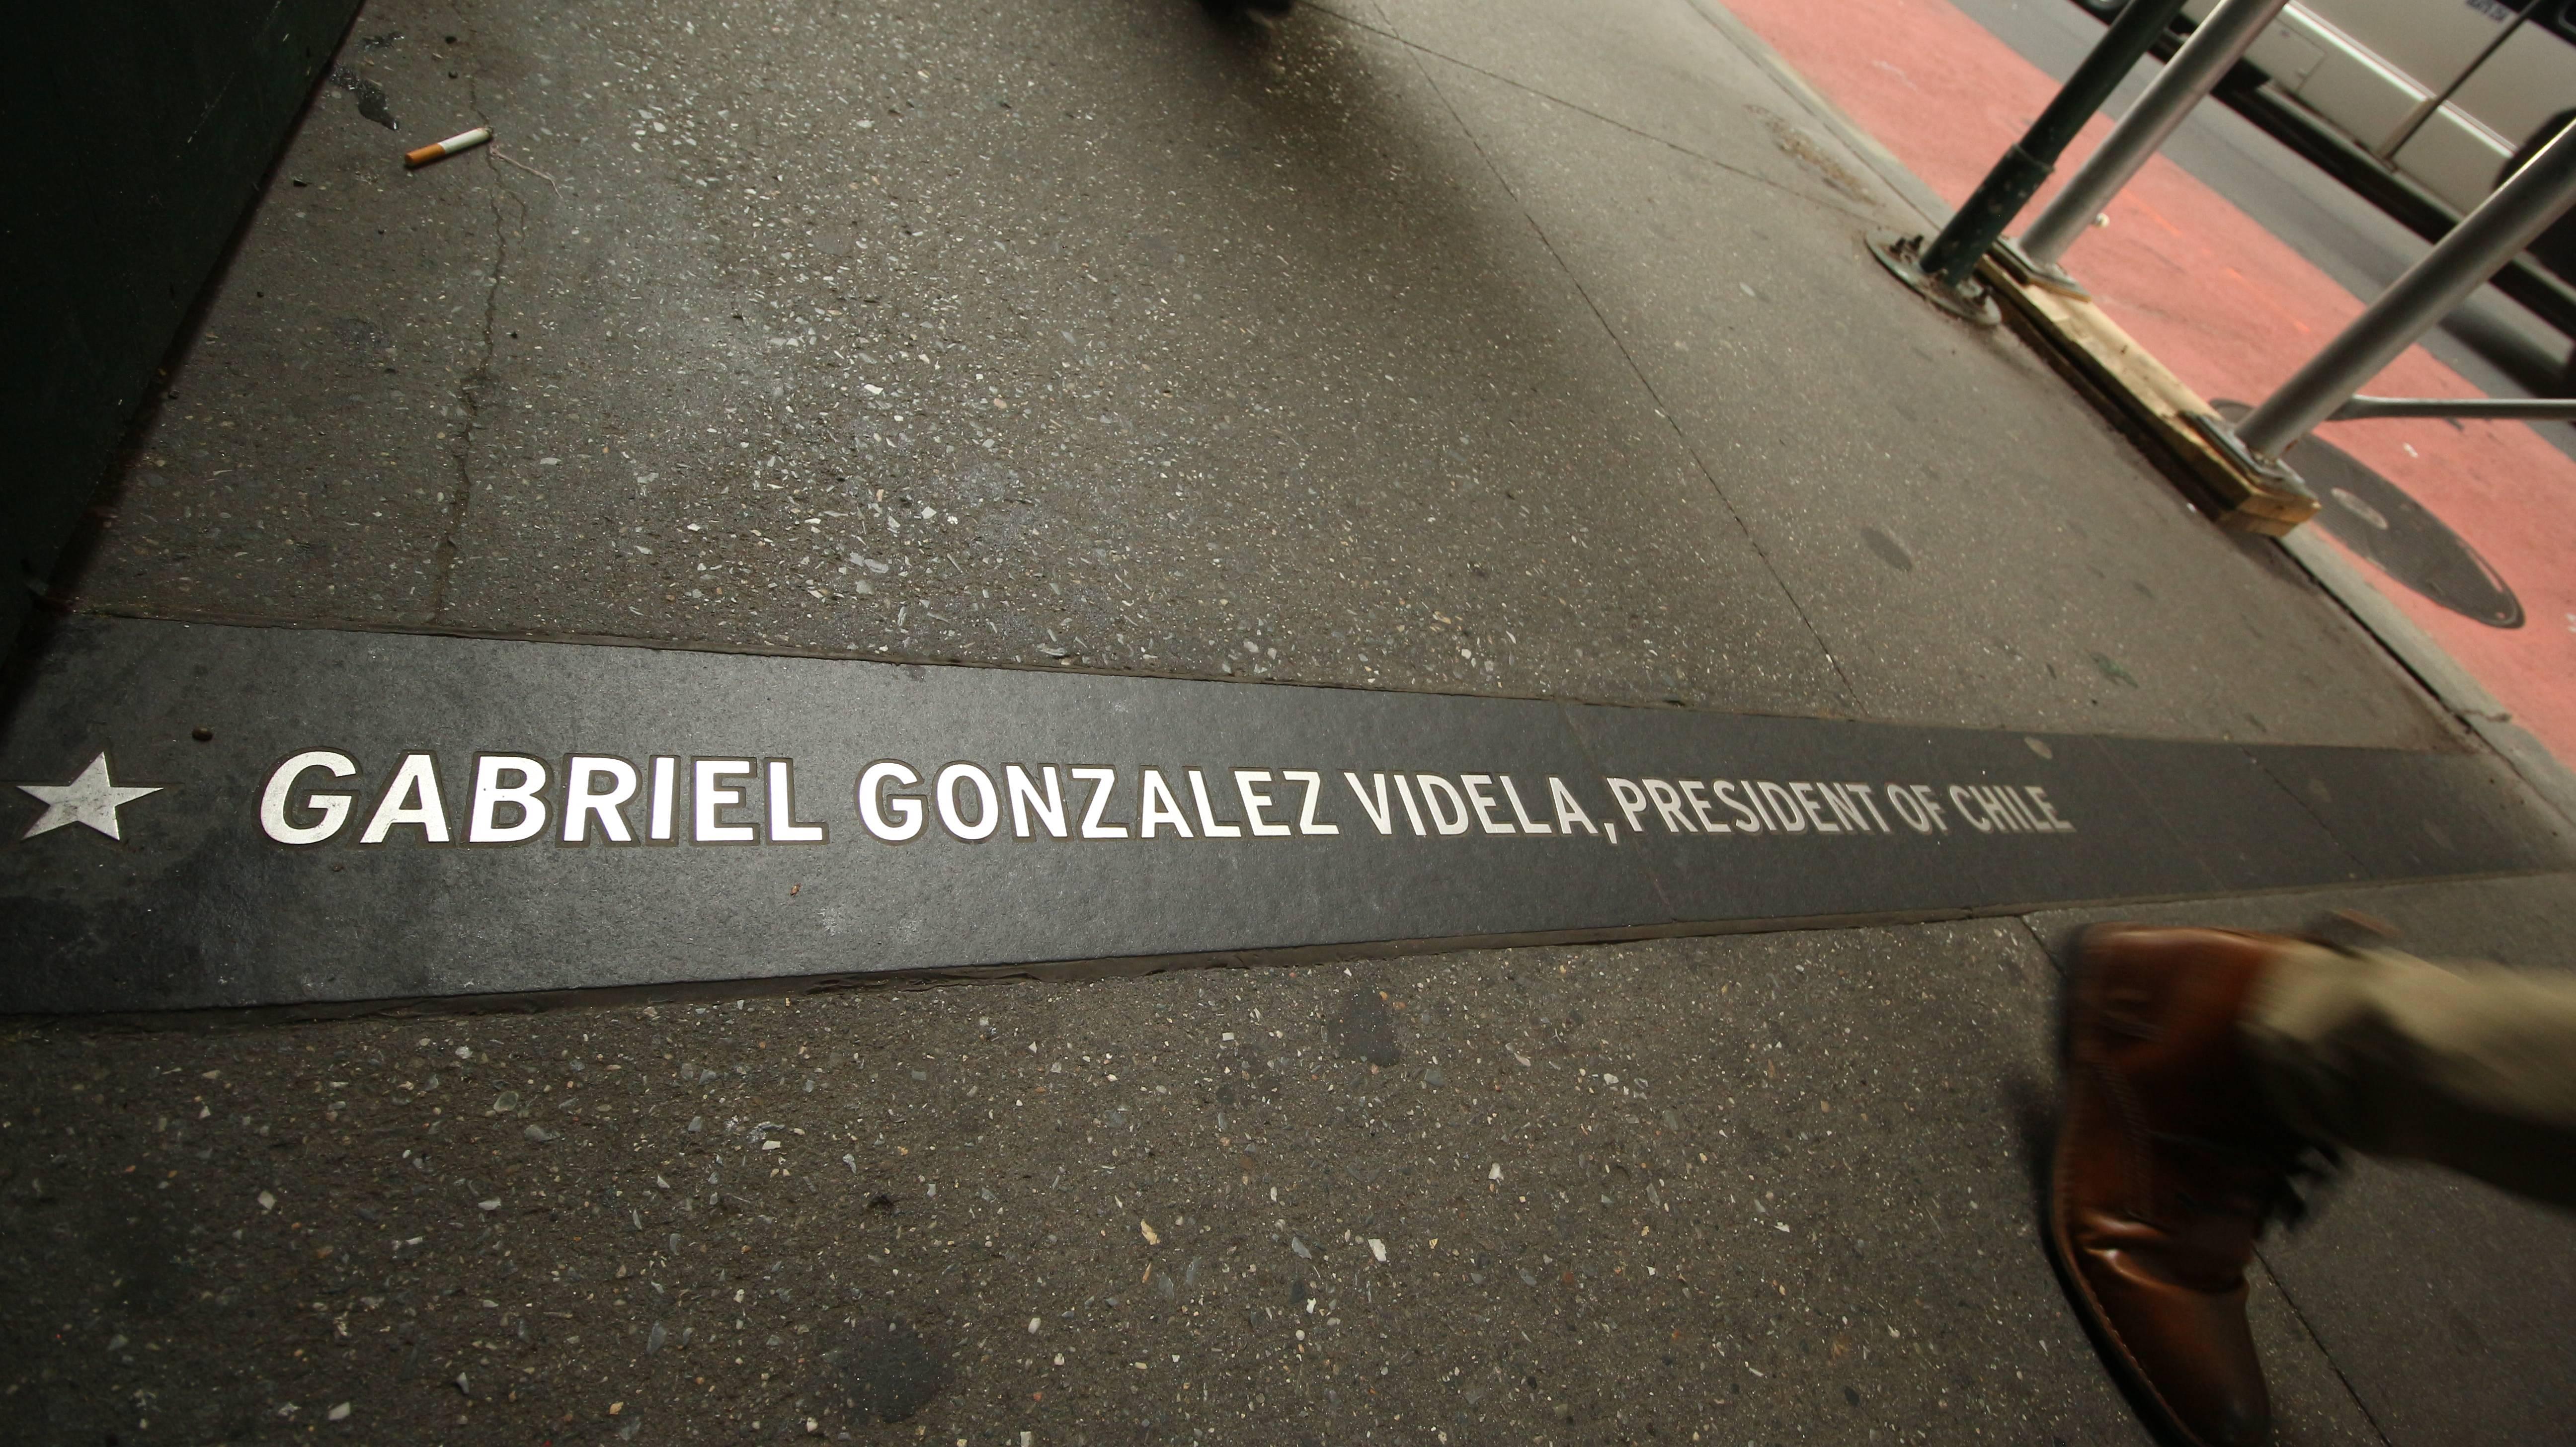 Chile: ¿Qué? A un costado de Wall Street se recuerda a un presidente chileno